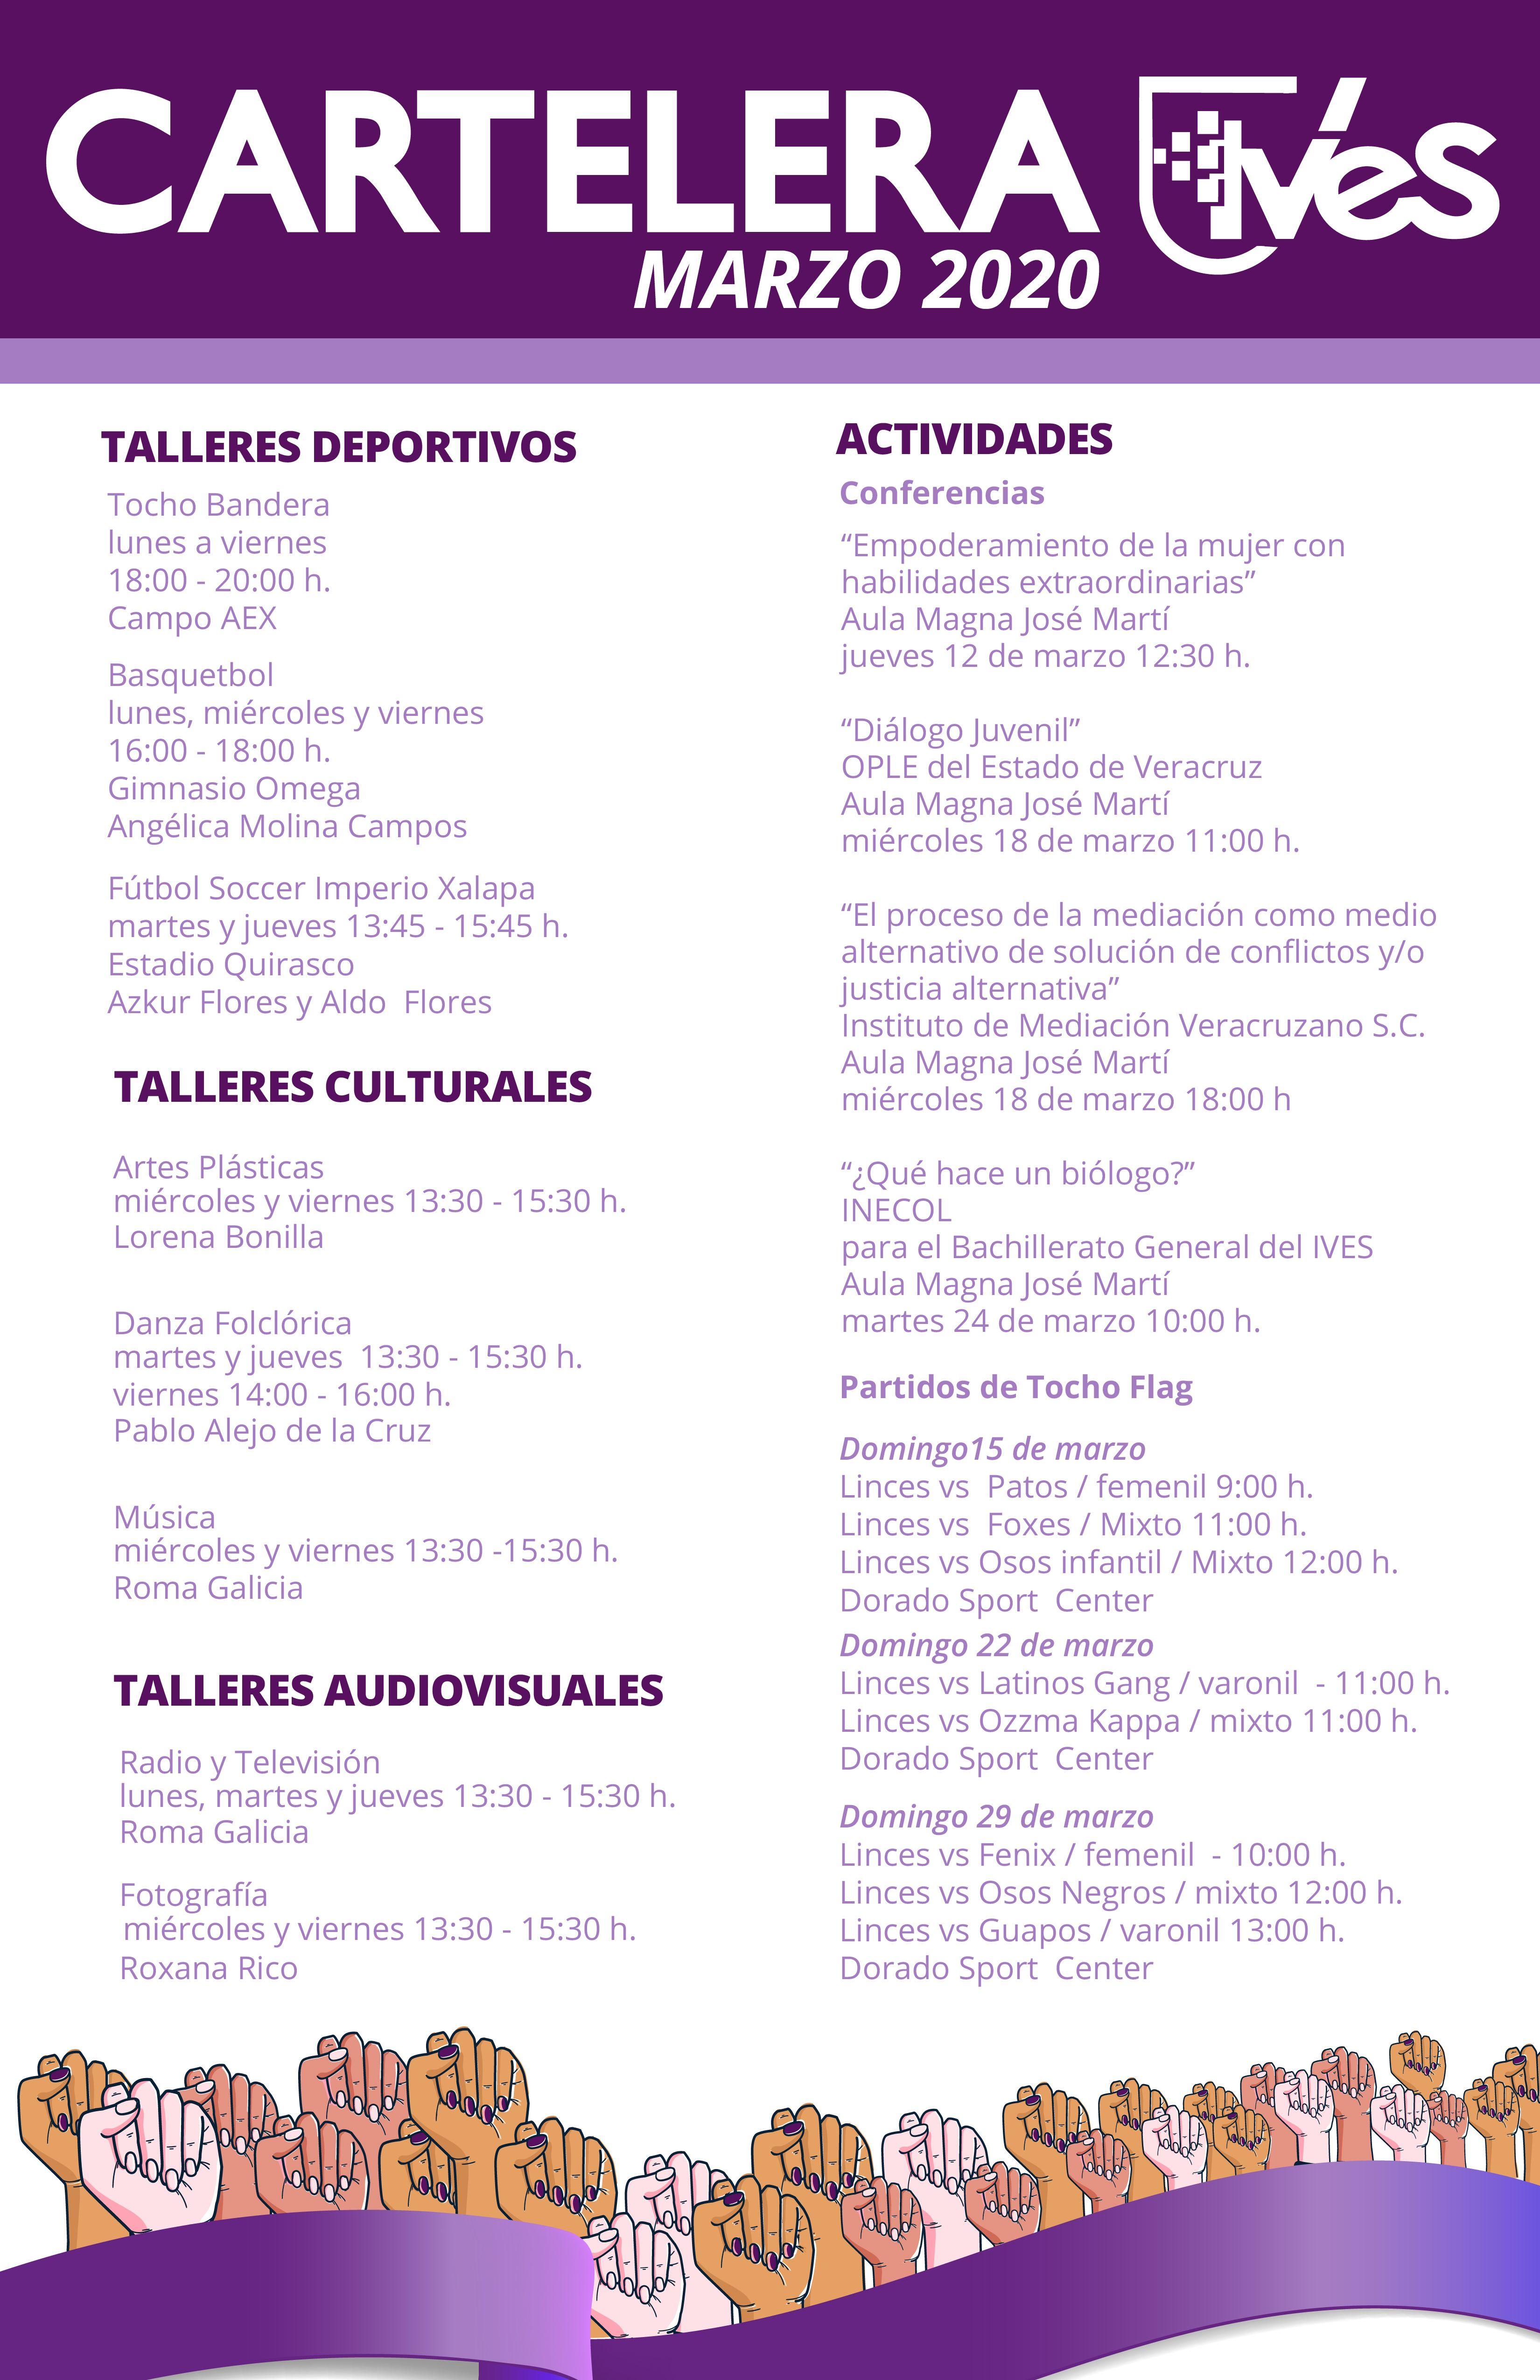 cartelera_marzo-01-compressor